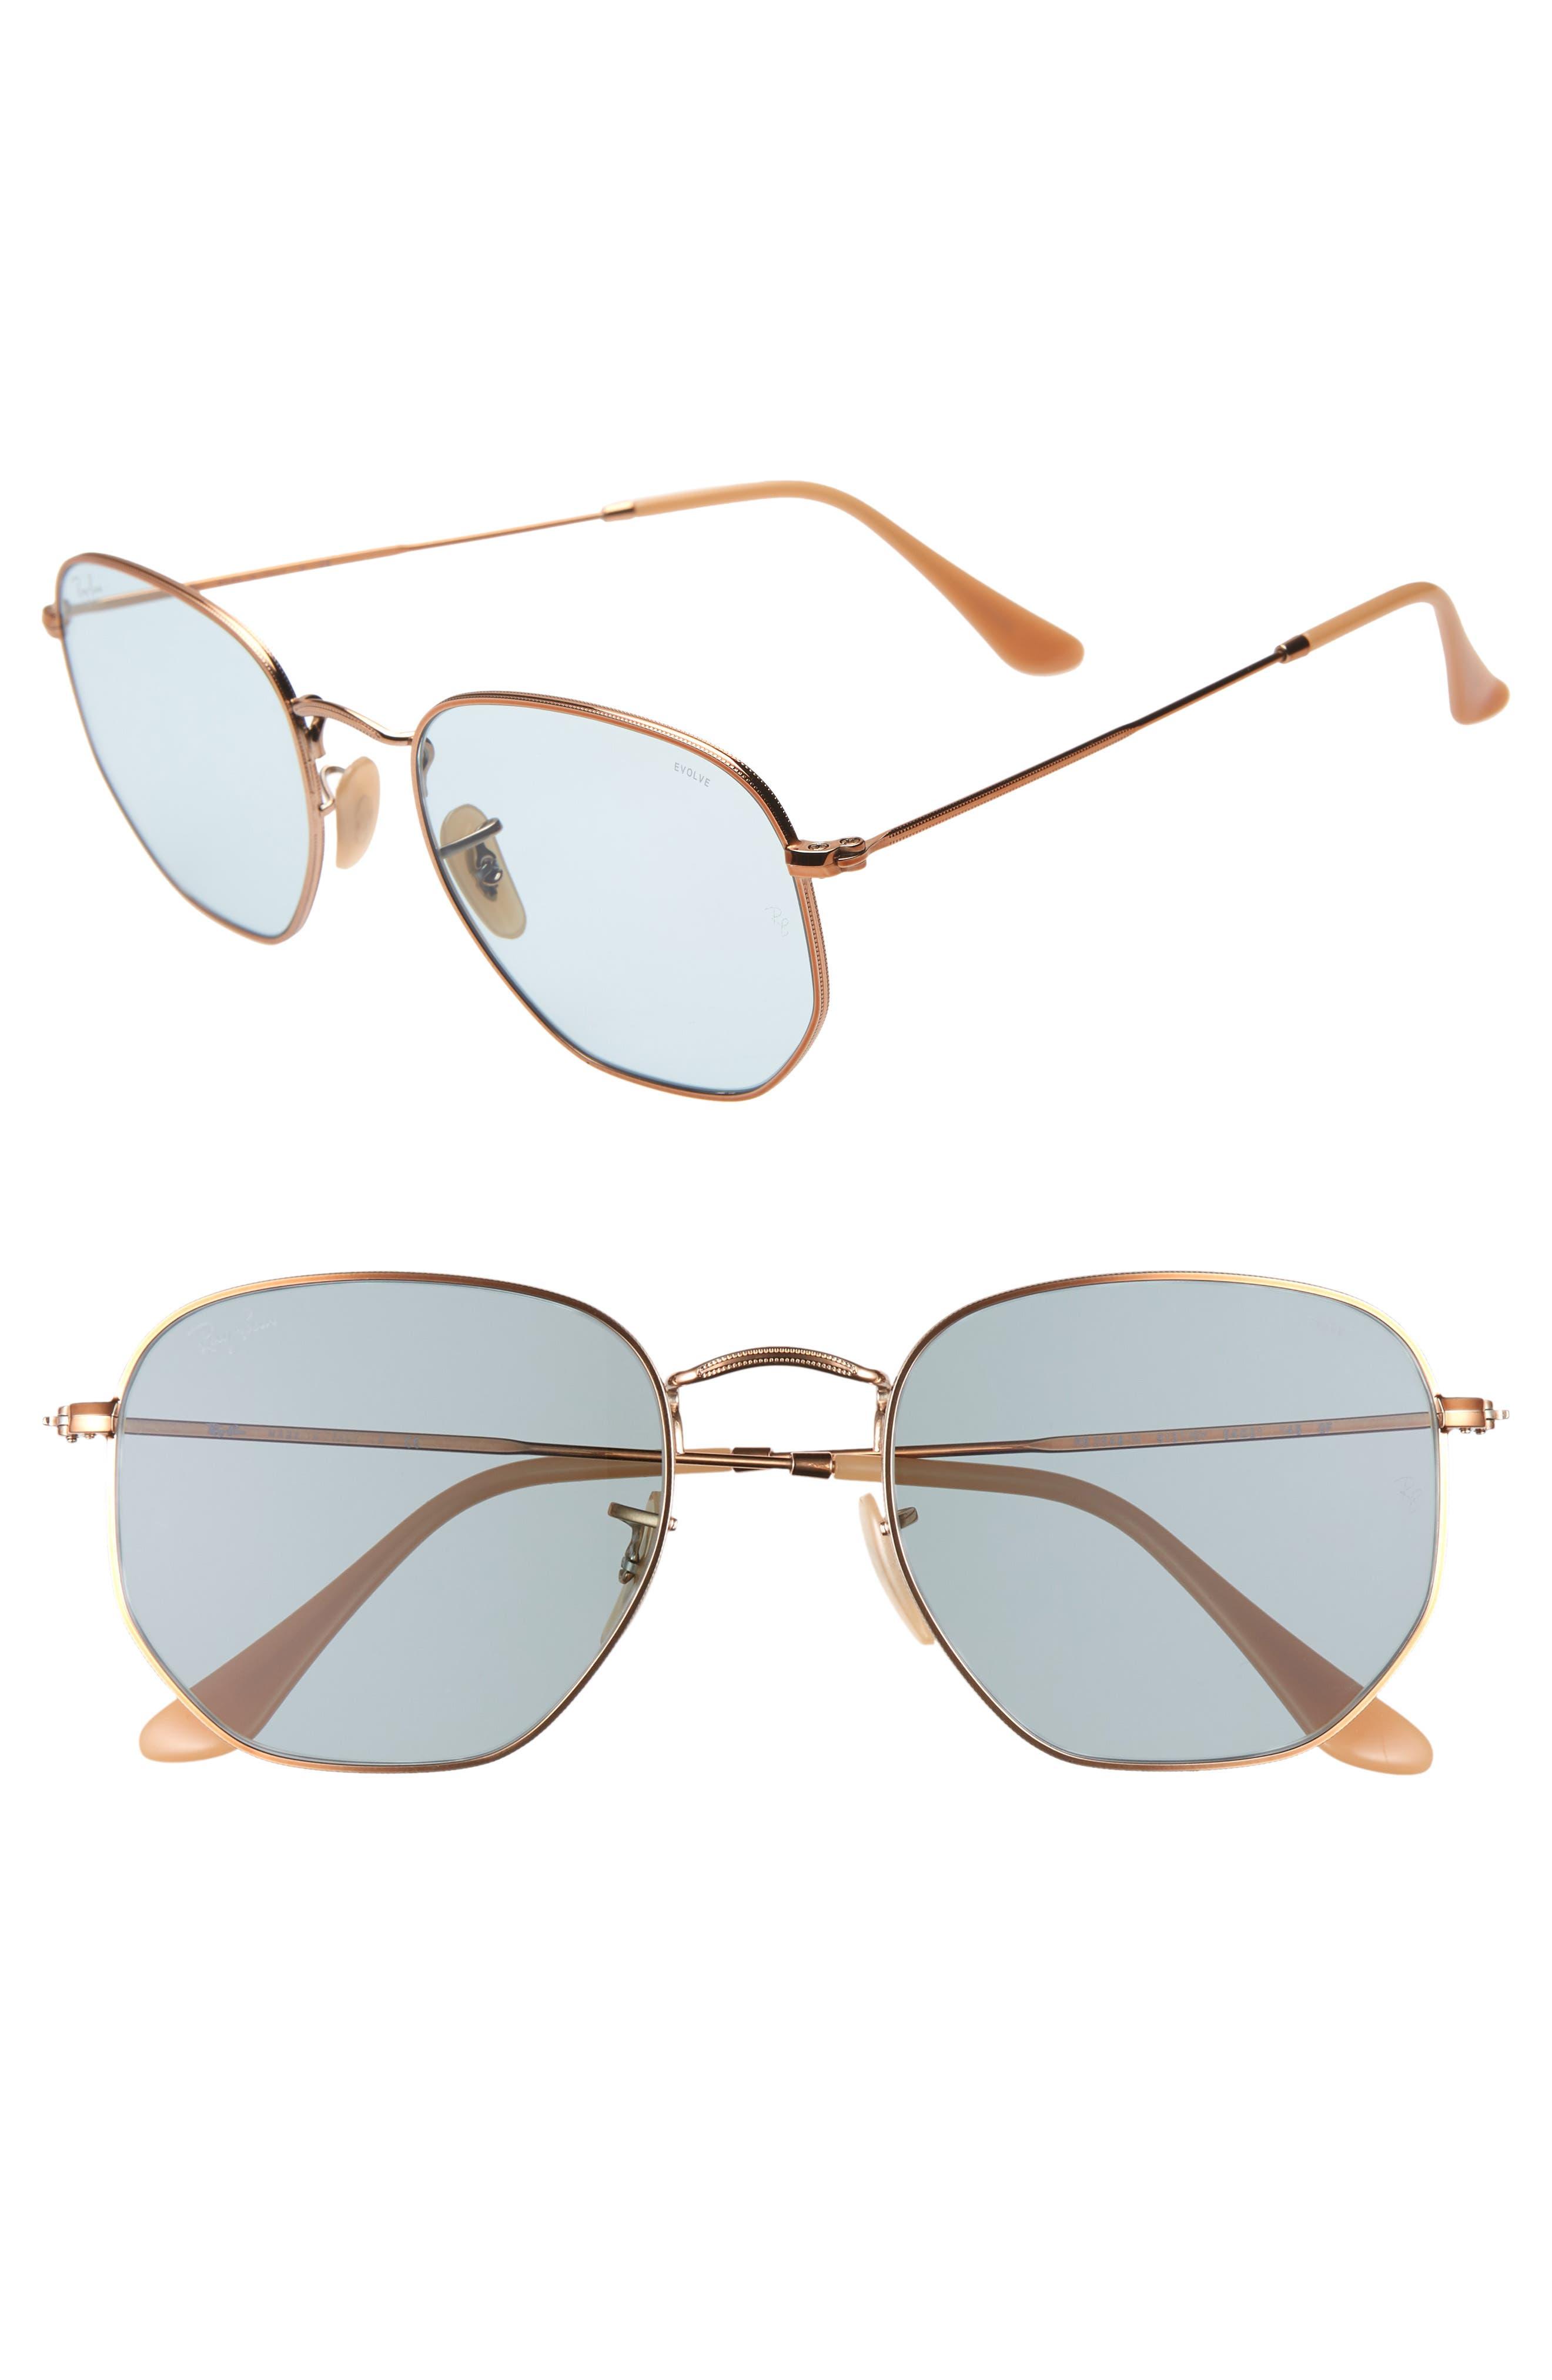 ,                             54mm Evolve Photochromic Hexagon Sunglasses,                             Main thumbnail 1, color,                             GOLD/ LIGHT BLUE SOLID